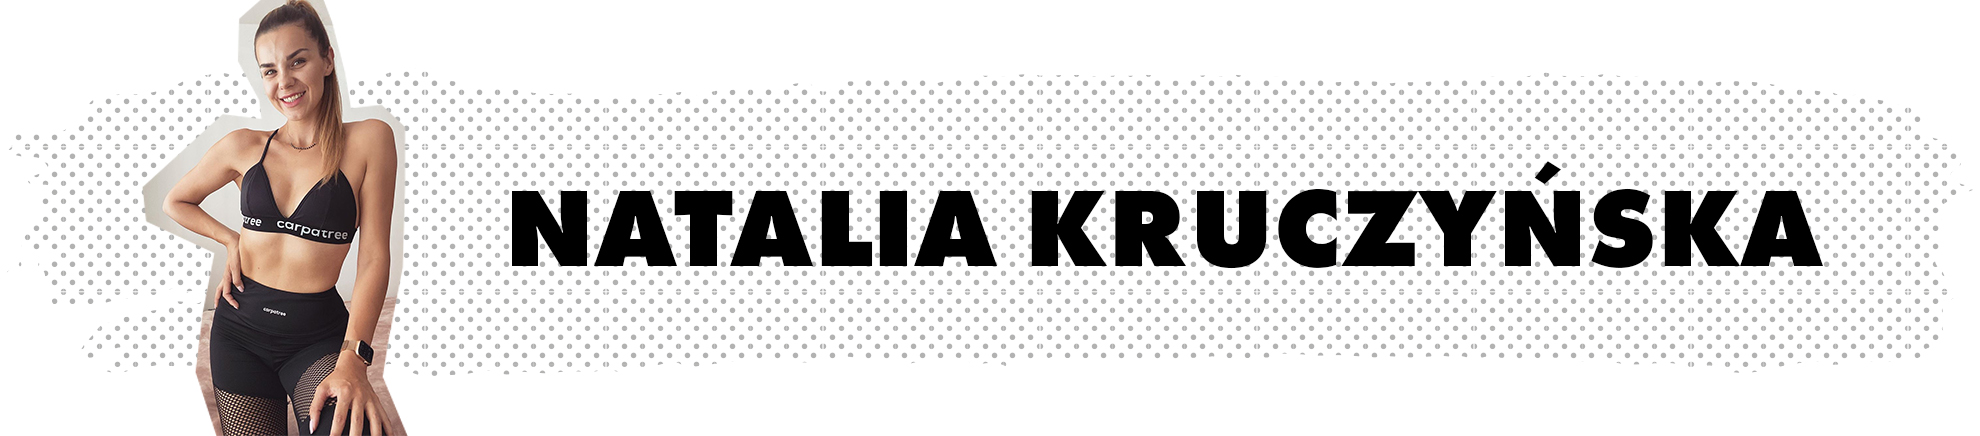 Natalia Kruczyńska - ambasadorka marki Carpatree